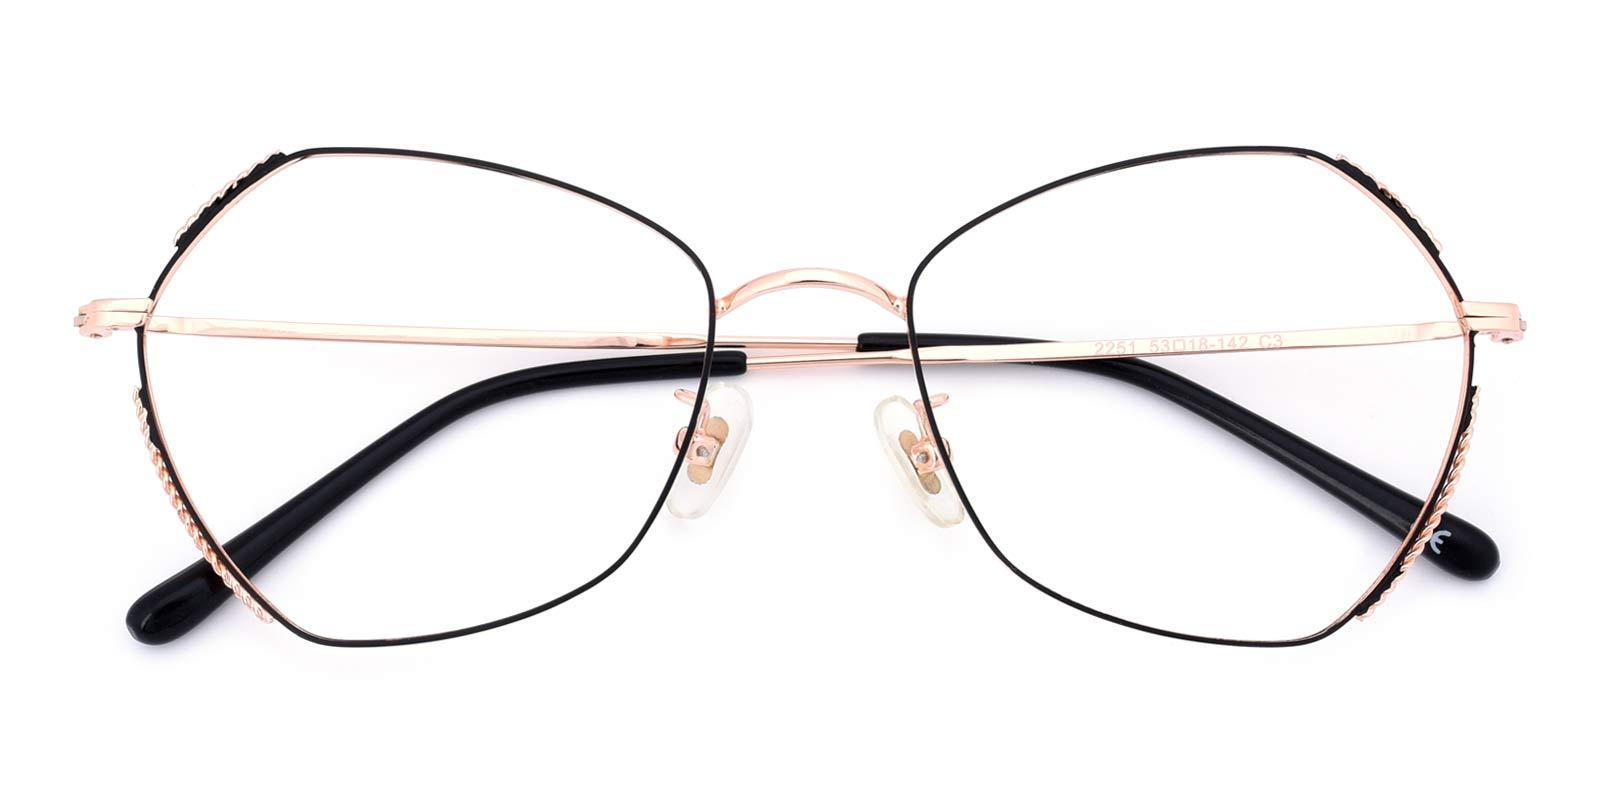 Summer-Gold-Geometric-Metal-Eyeglasses-detail